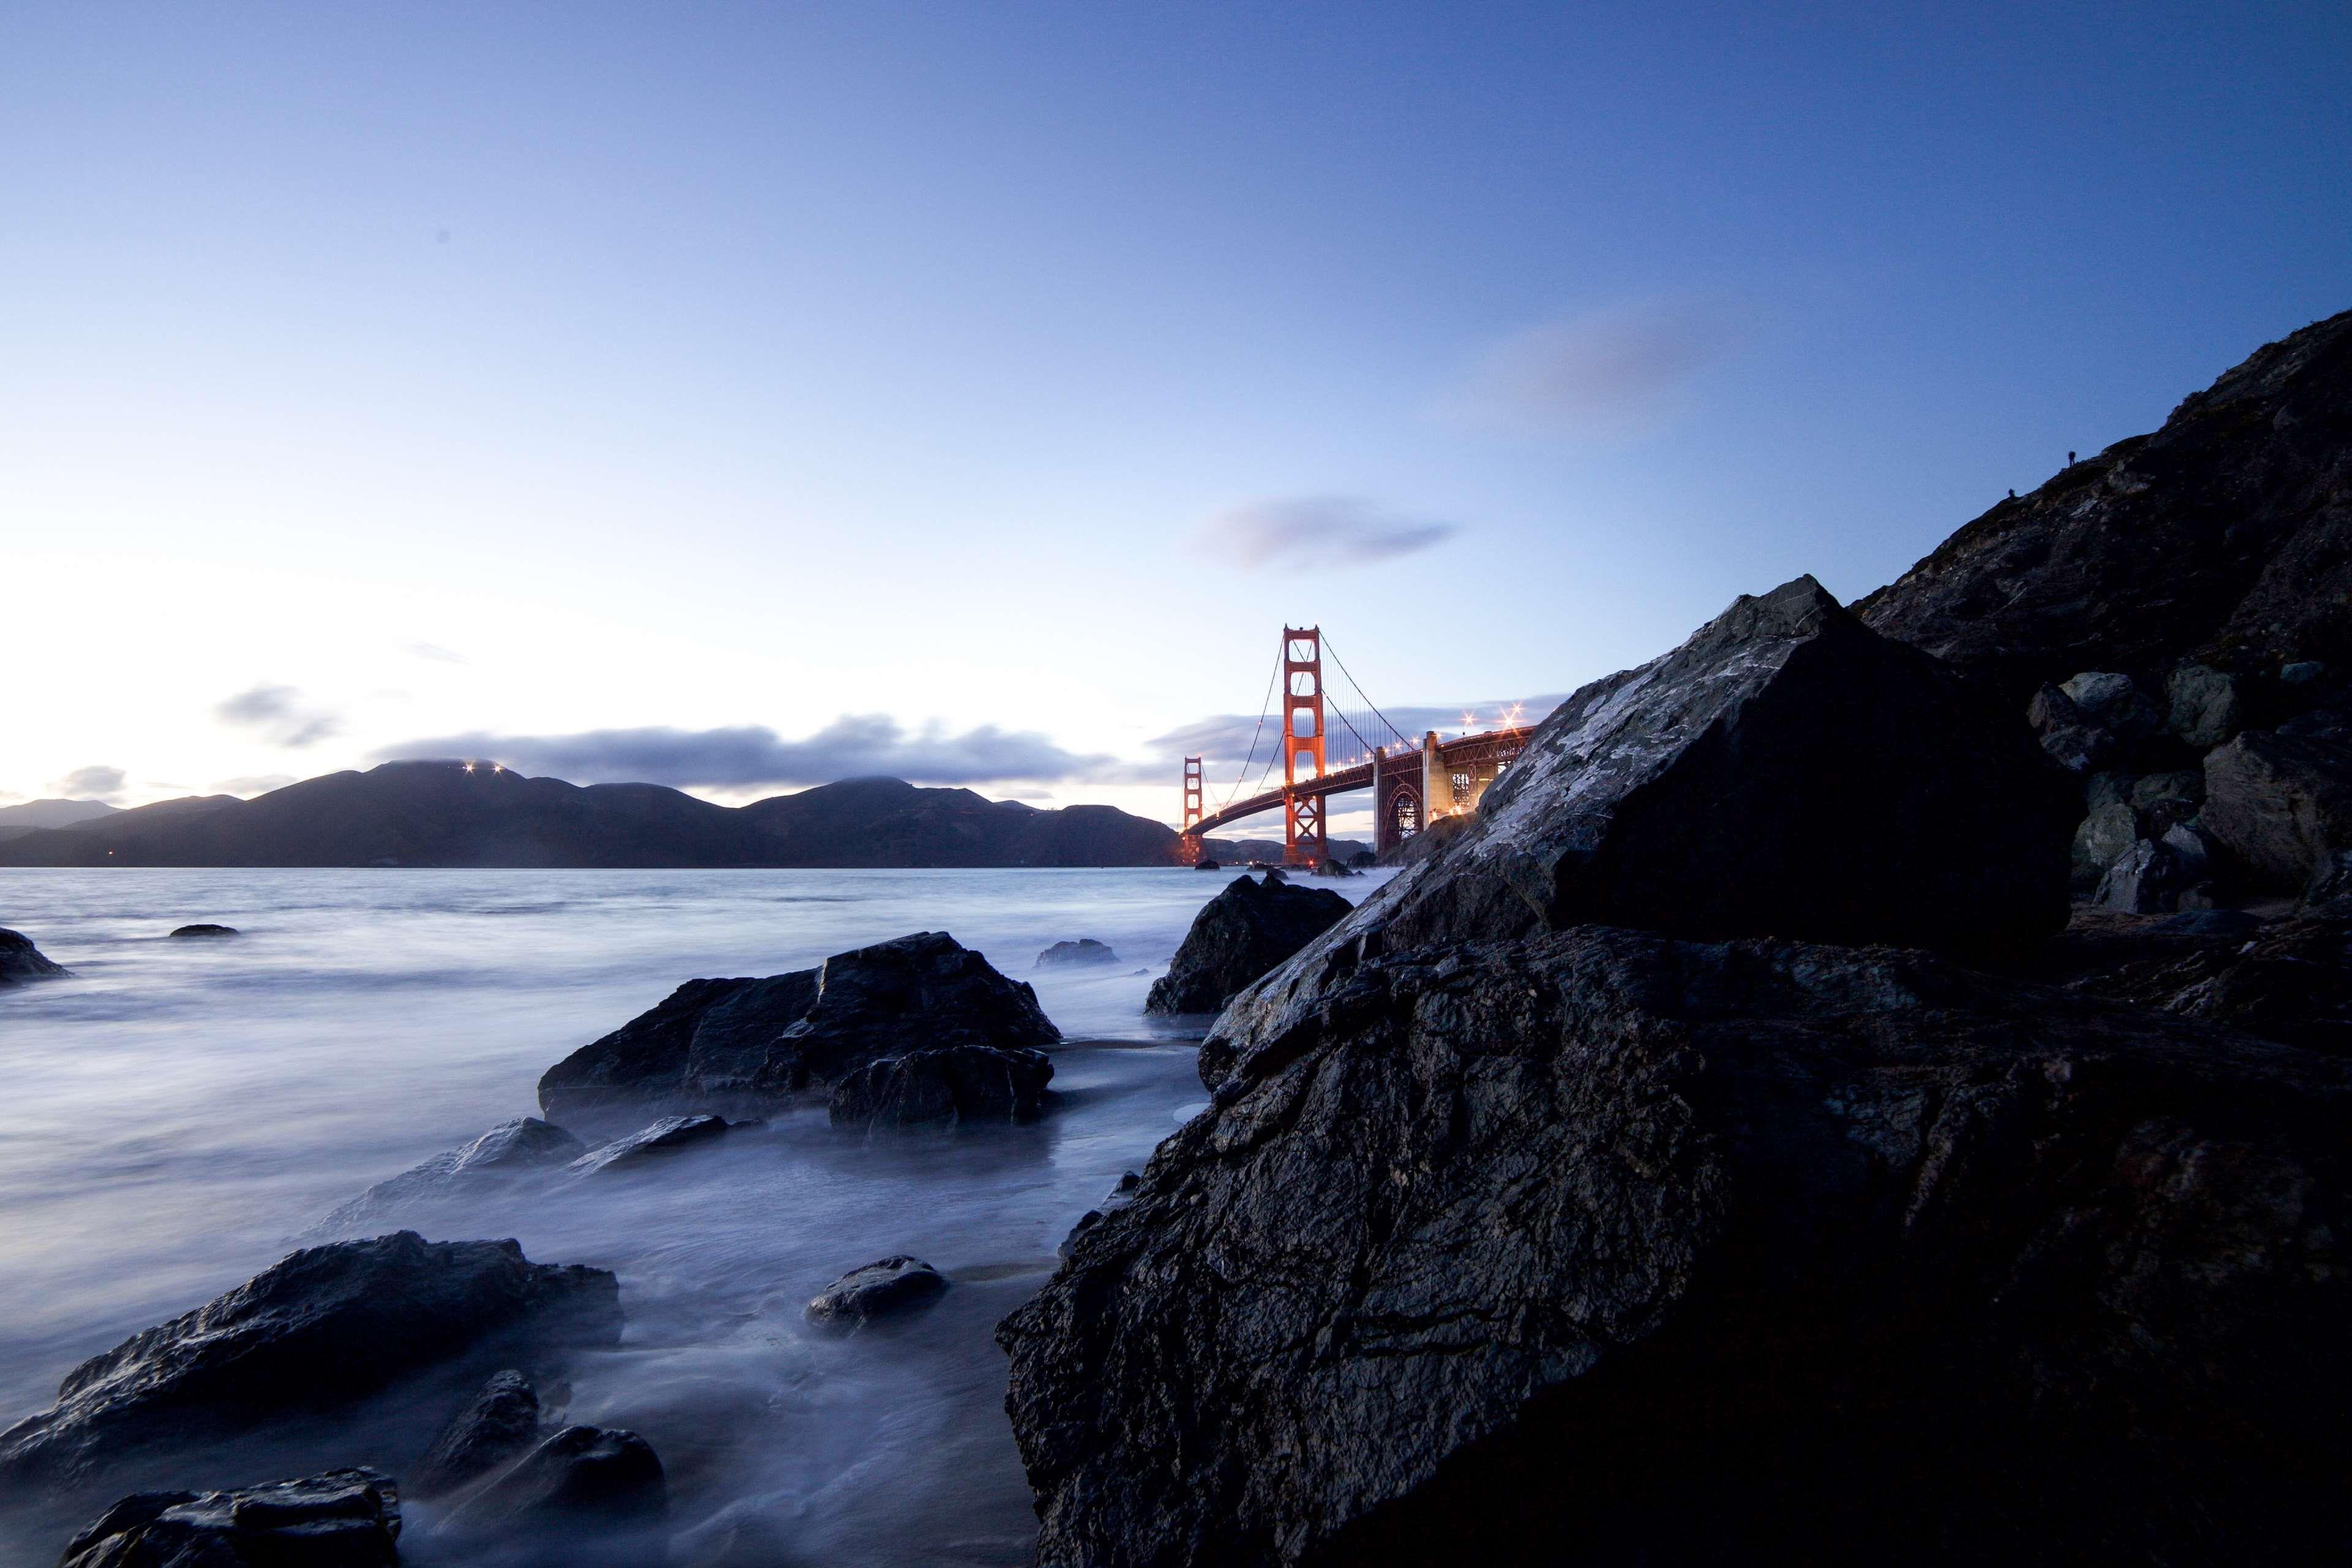 Coast Golden Gate Bridge Mountains Nature Ocean Rocks San Francisco Sea Sky Suspension Bridge Water Scenic Photos Take Better Photos Mountain Photos Golden gate bridge sea coast rocks